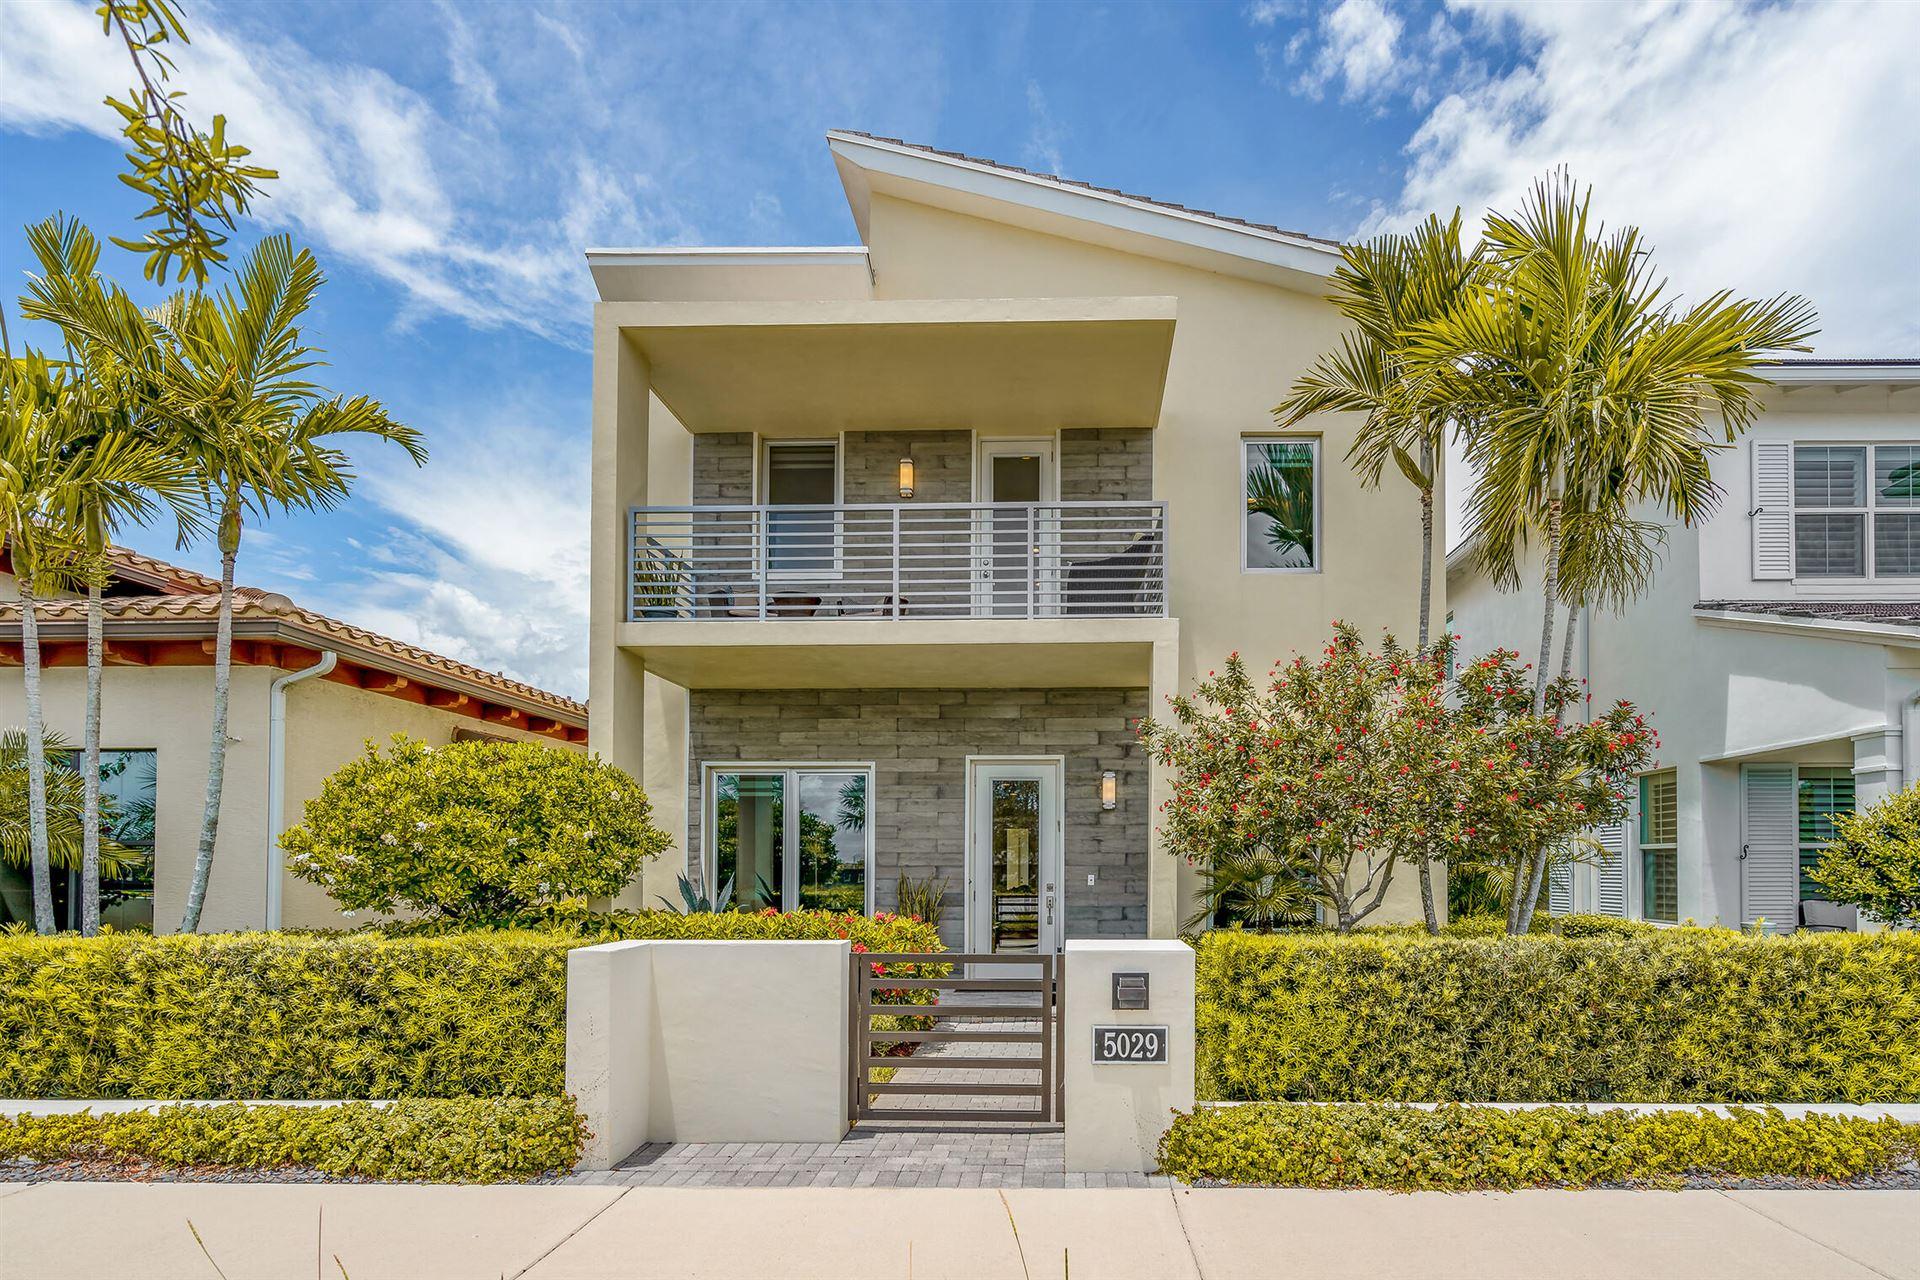 5029 Grandiflora Road, Palm Beach Gardens, FL 33418 - #: RX-10721332